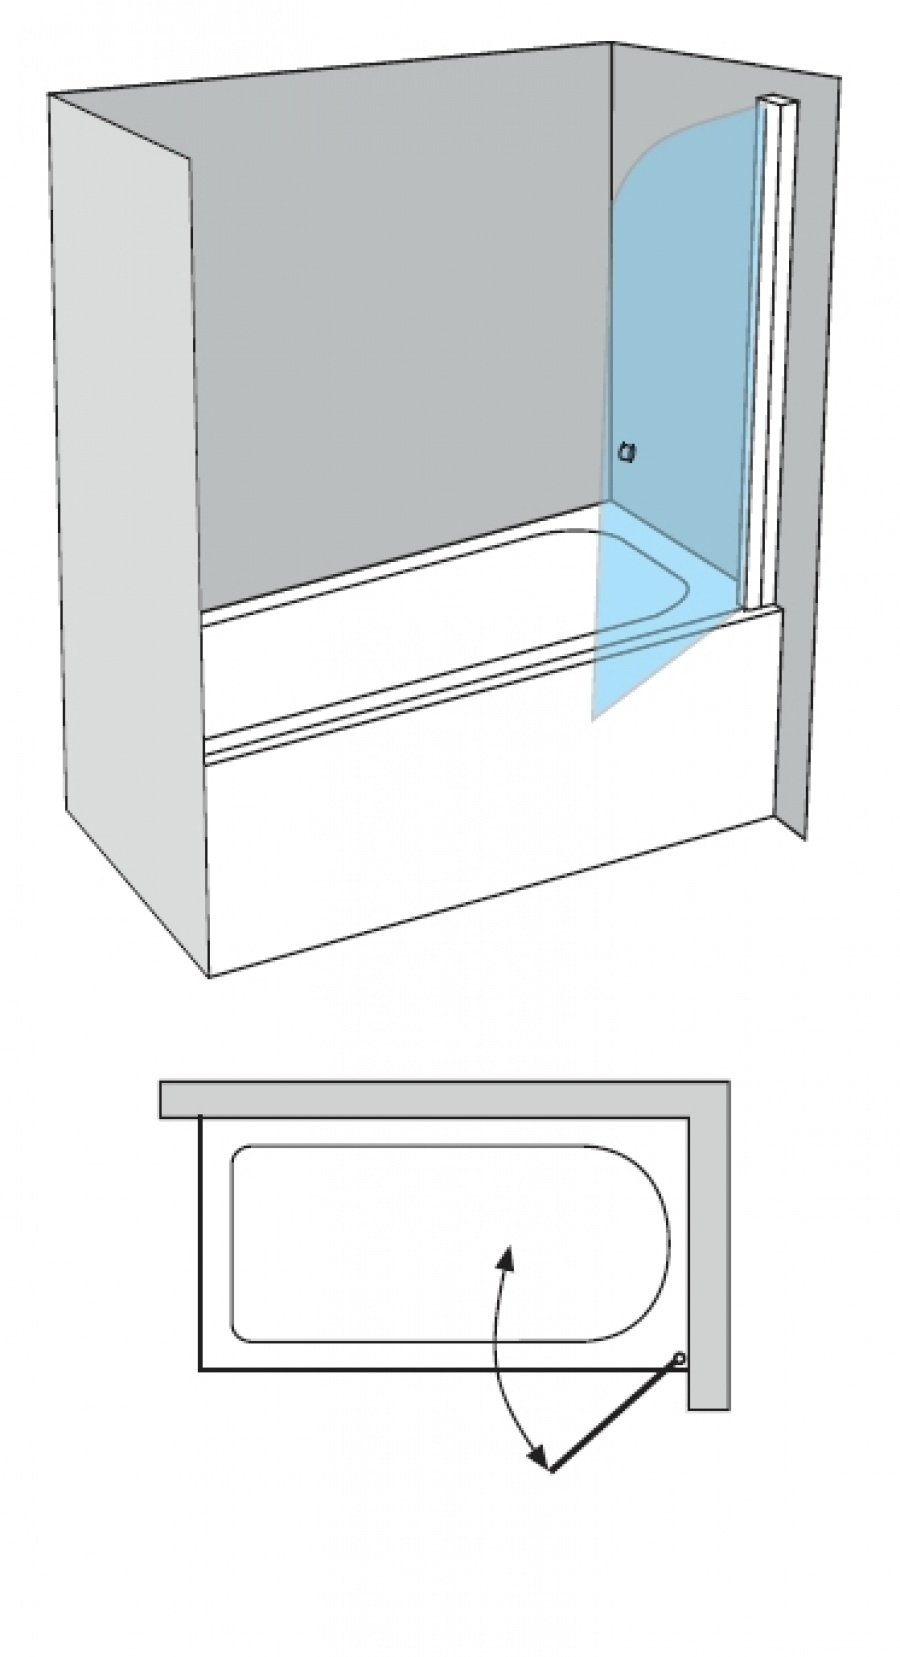 pare bain arcoiris pivotant verre fum sabl aqua 70x150. Black Bedroom Furniture Sets. Home Design Ideas